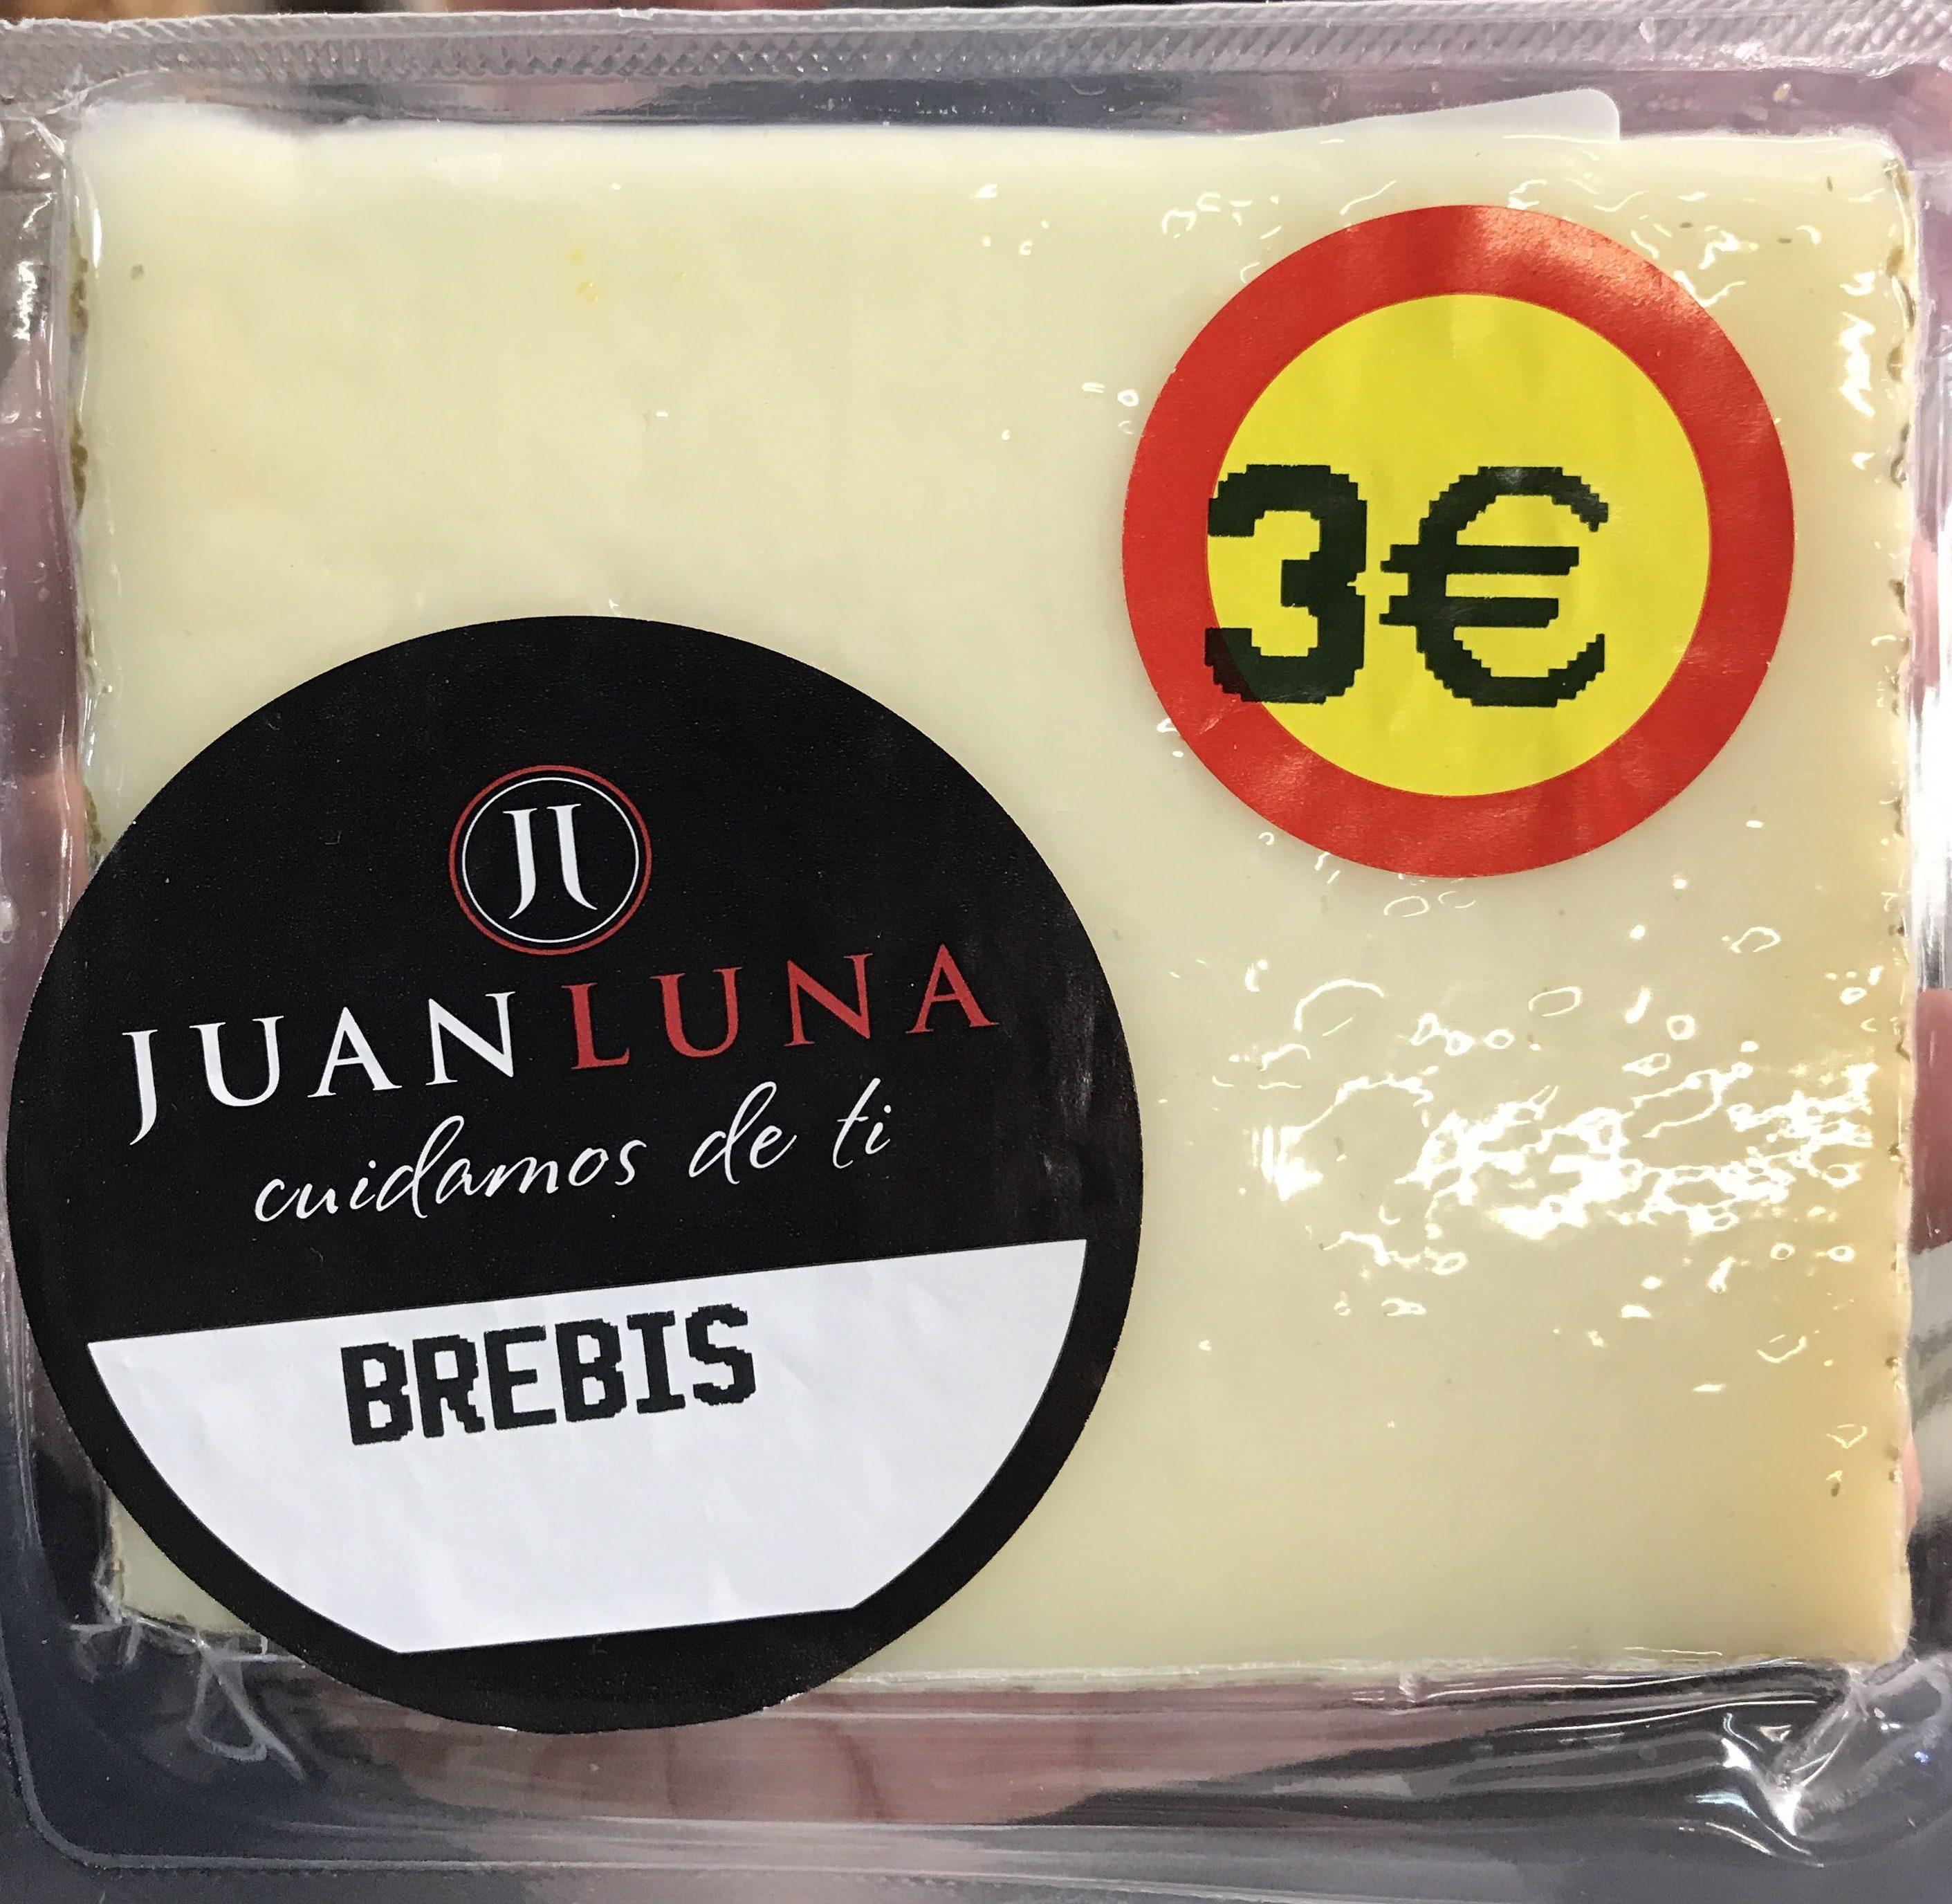 Brebis - Juan Luna - 0,150 kg